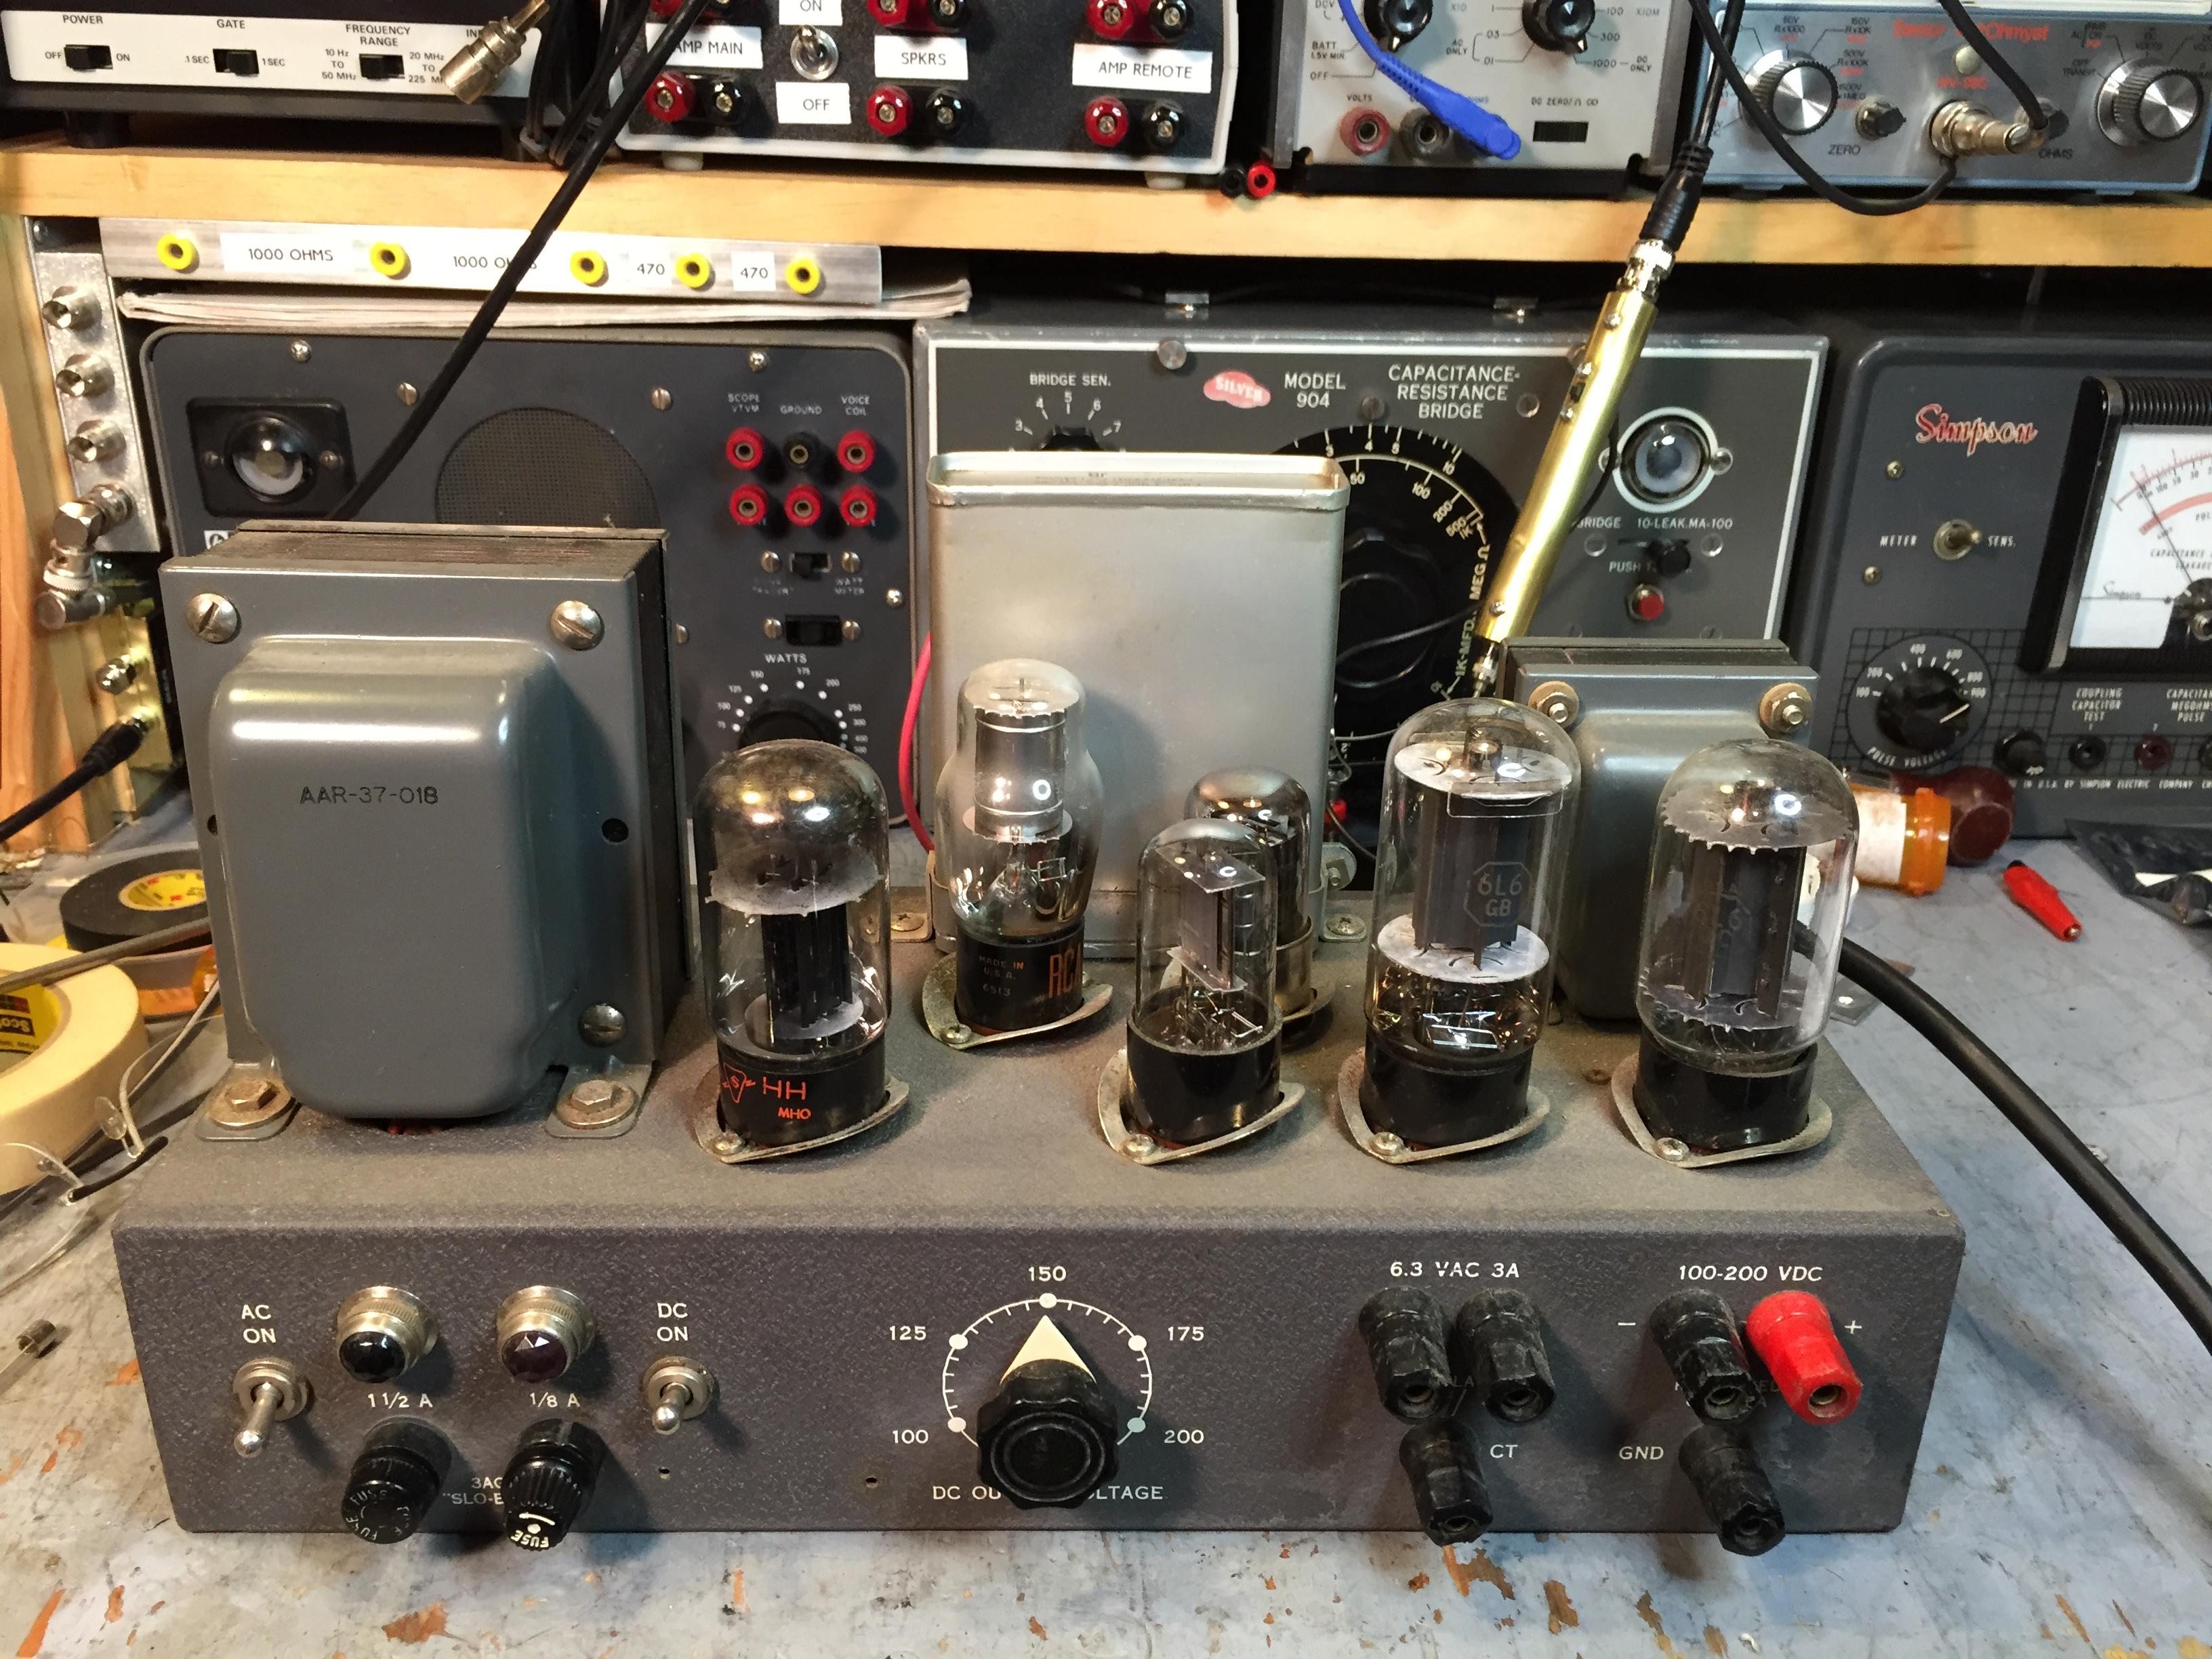 Lambda 26 high voltage power supply | Steve's Web Junkyard